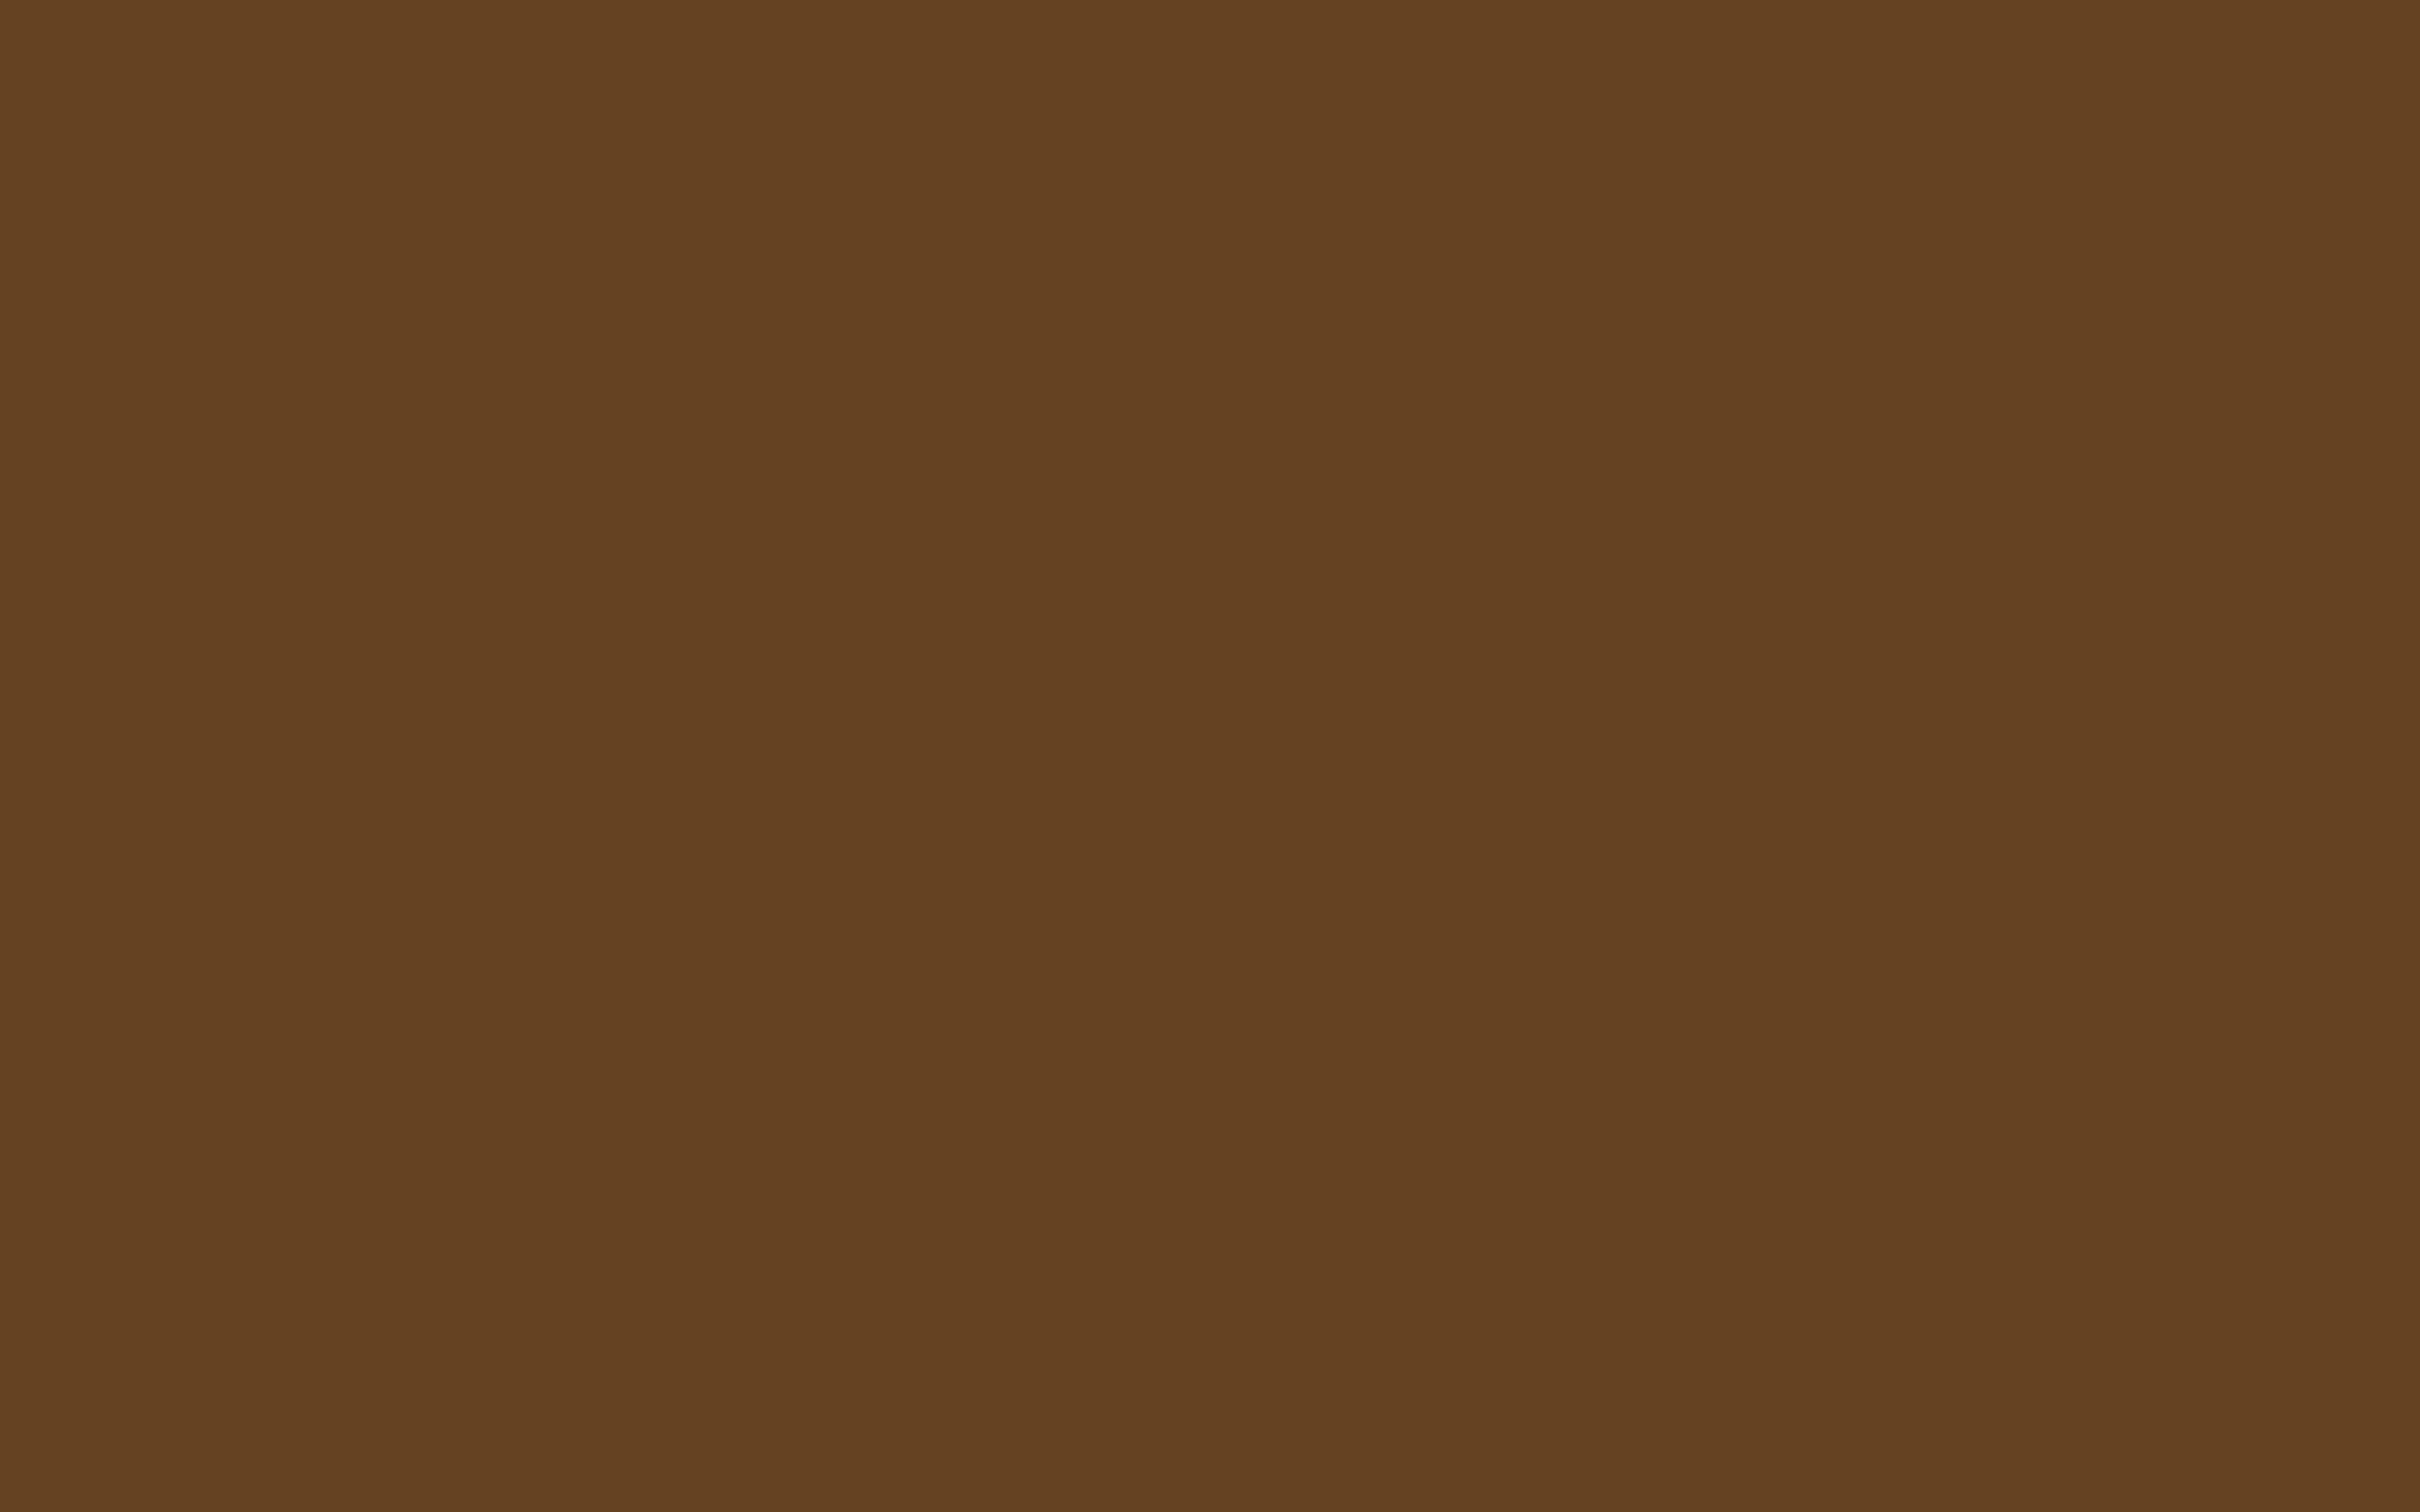 2560x1600 Dark Brown Solid Color Background